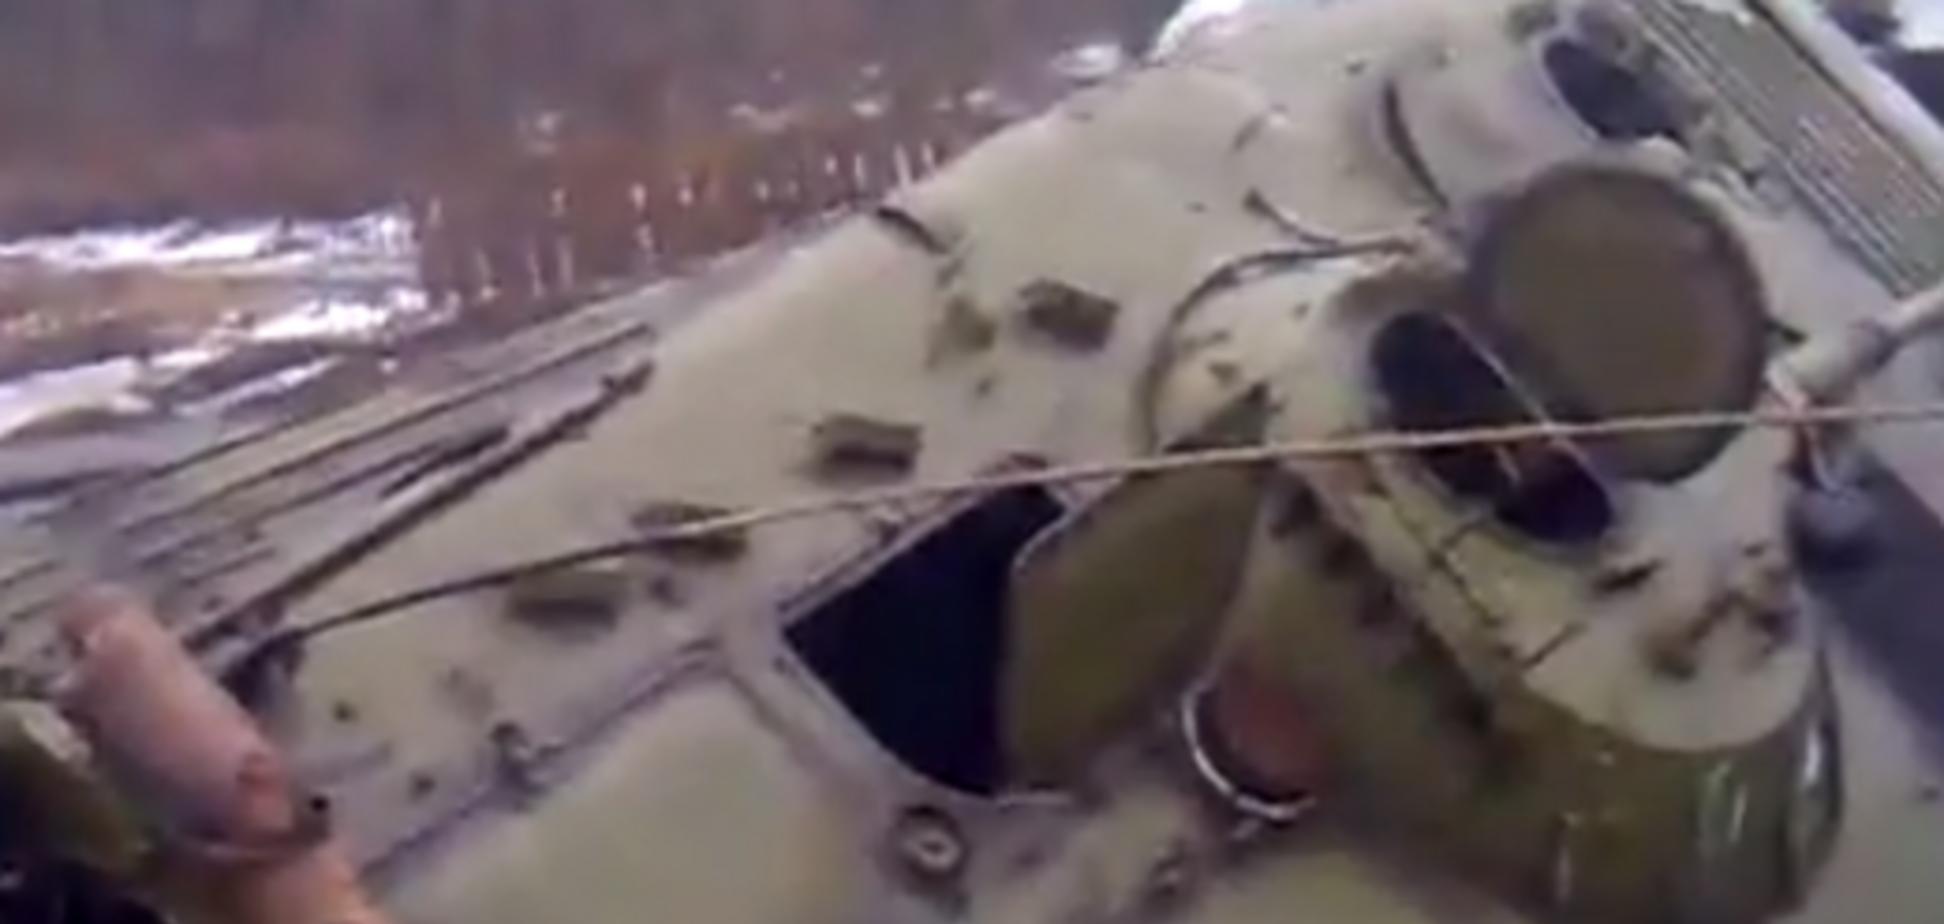 БМП террористов провалилась на мосту: видеофакт